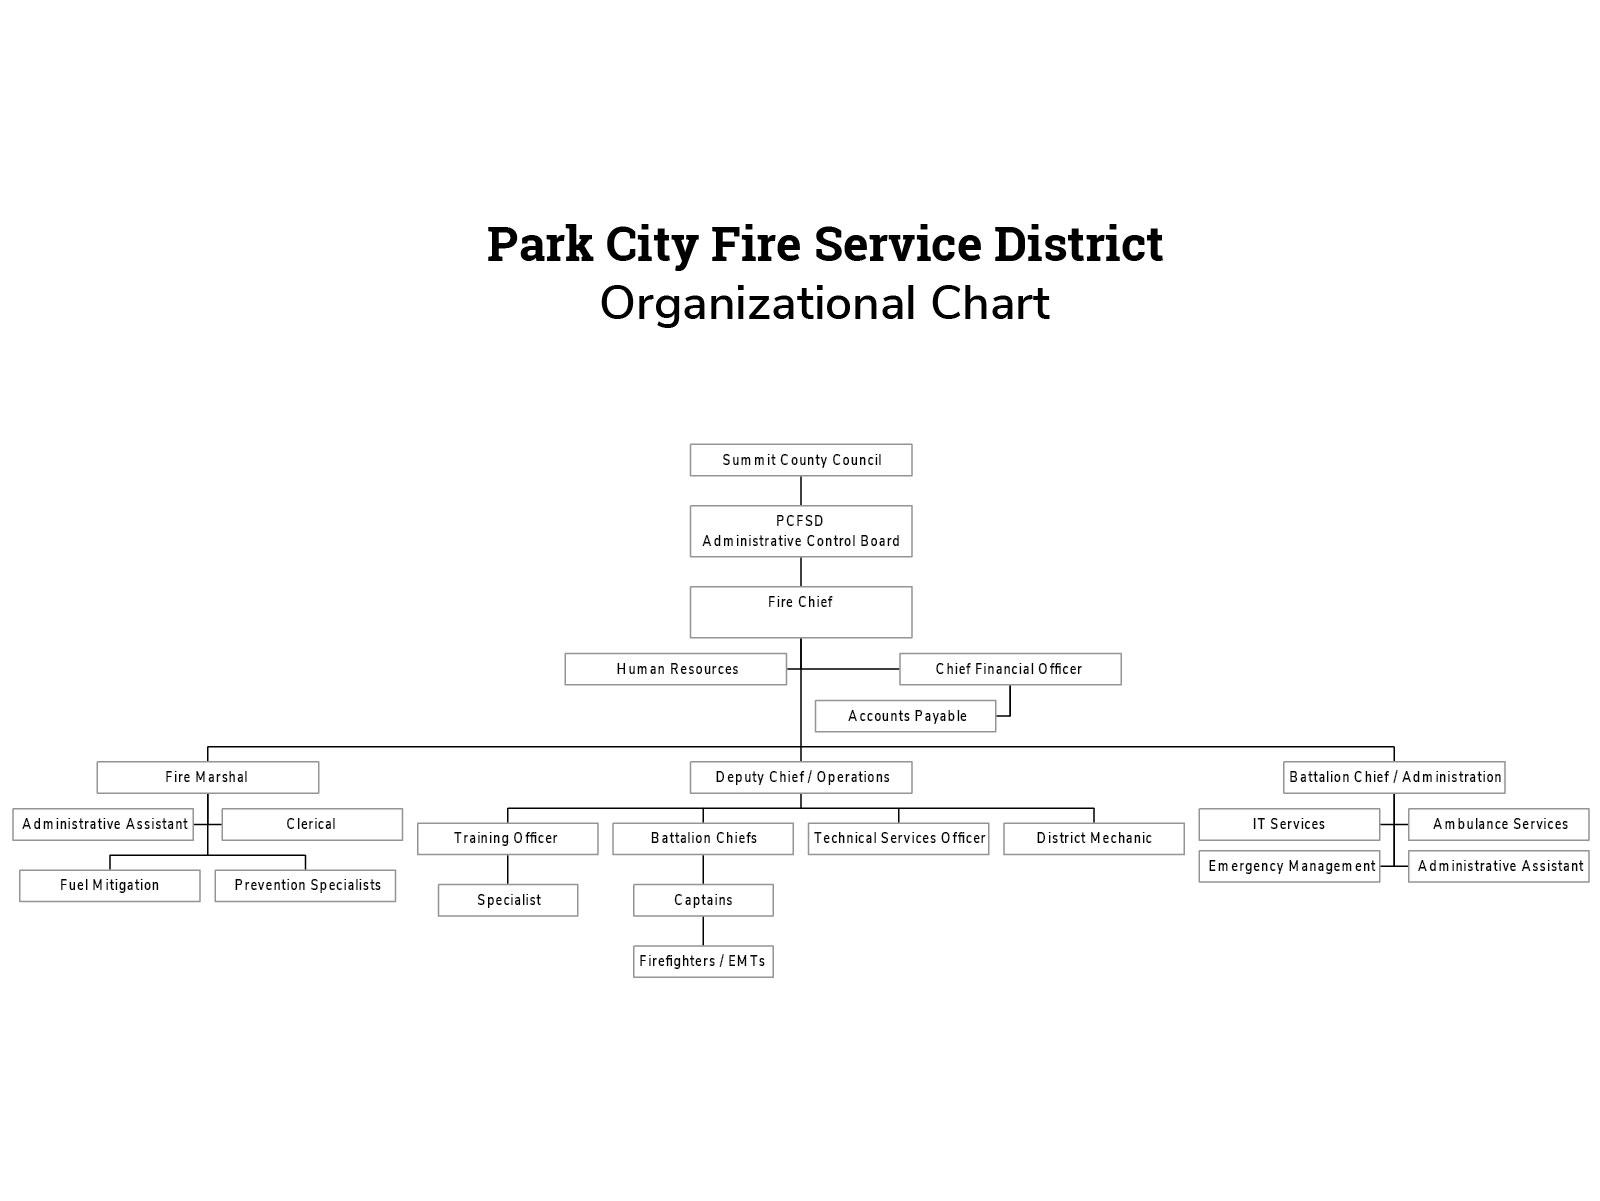 History park city fire district command staff control board organizational chart xflitez Images